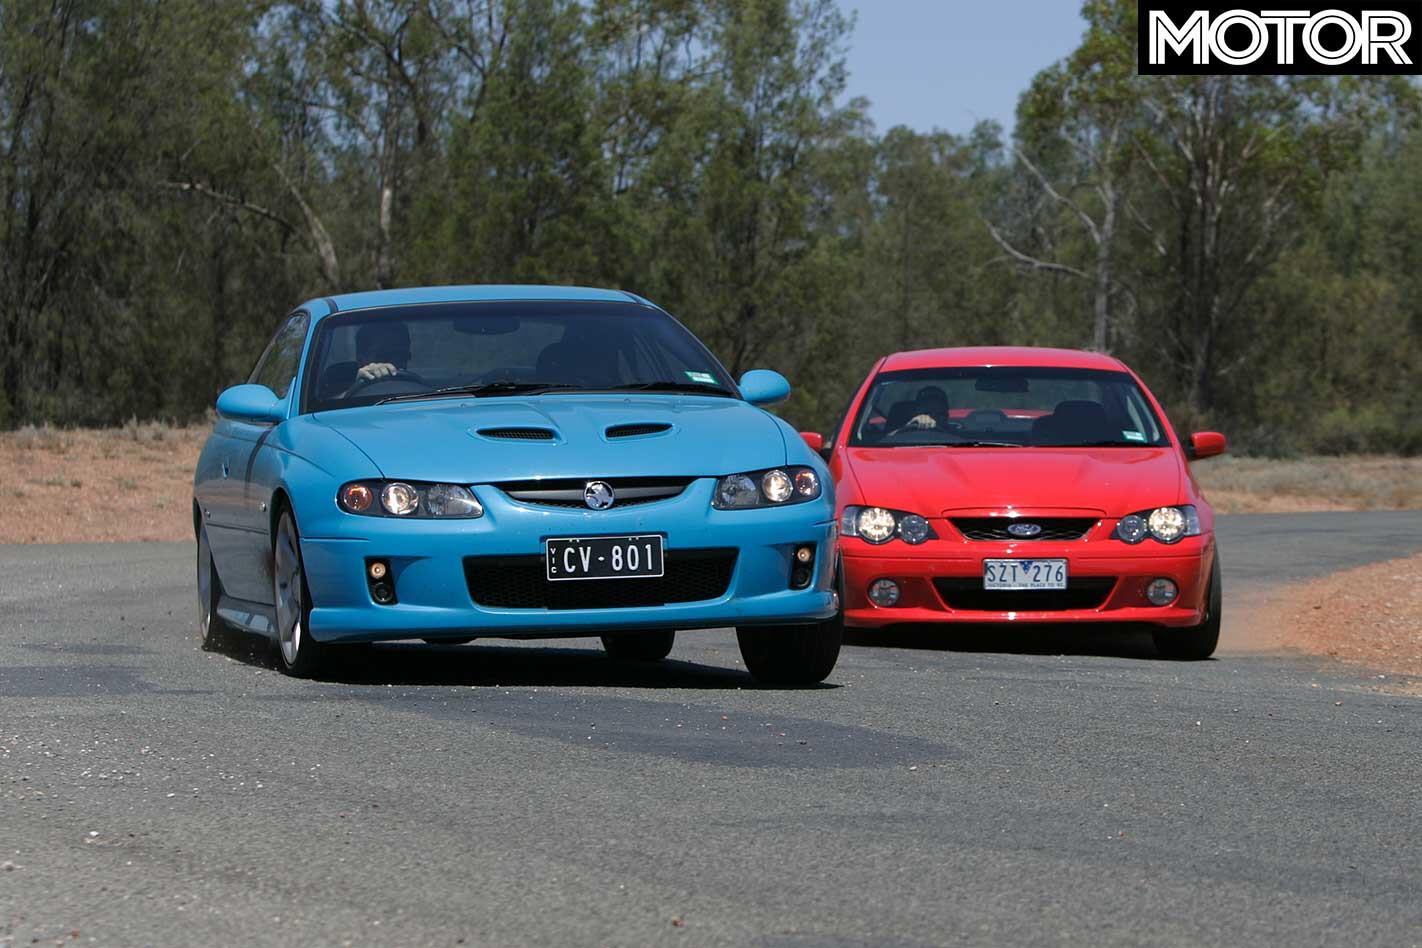 All Aussie Showdown 2005 Holden Monaro CV 8 Vs Ford Falcon XR 8 Comparison Jpg